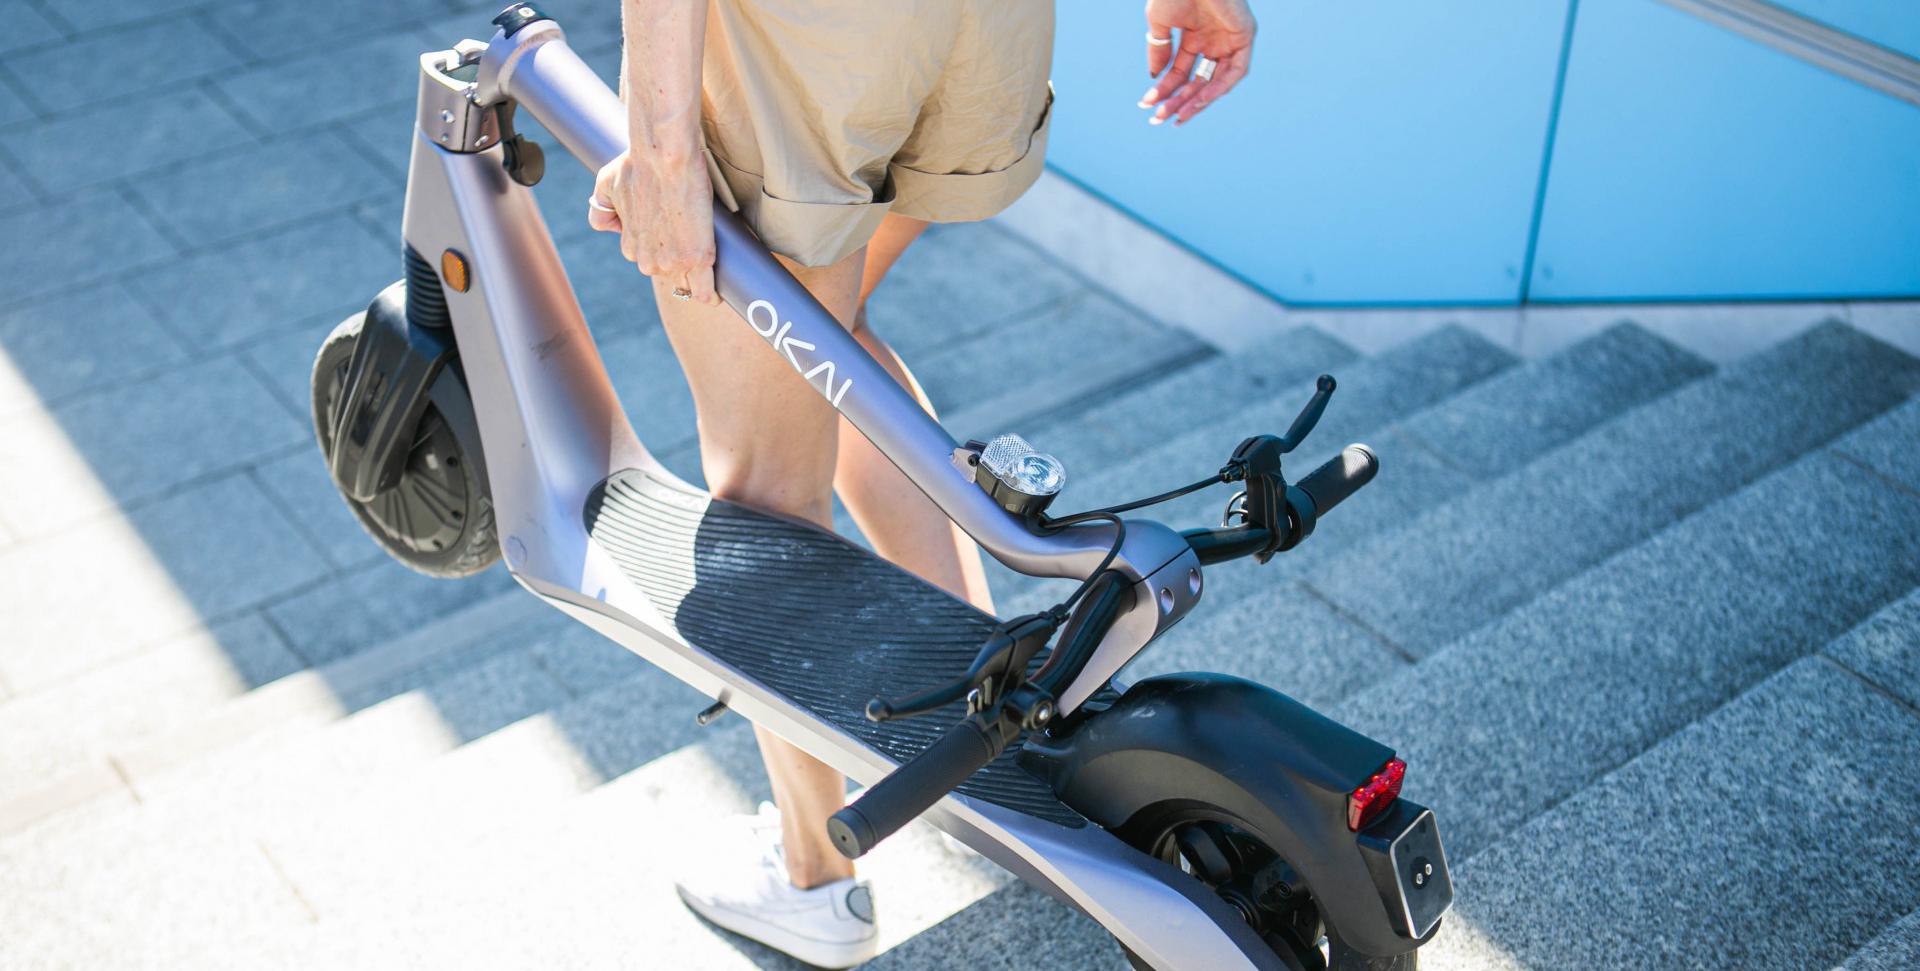 okai-electric-scooter-_-electric-bike-manufacturer-es500-4 (1).jpg